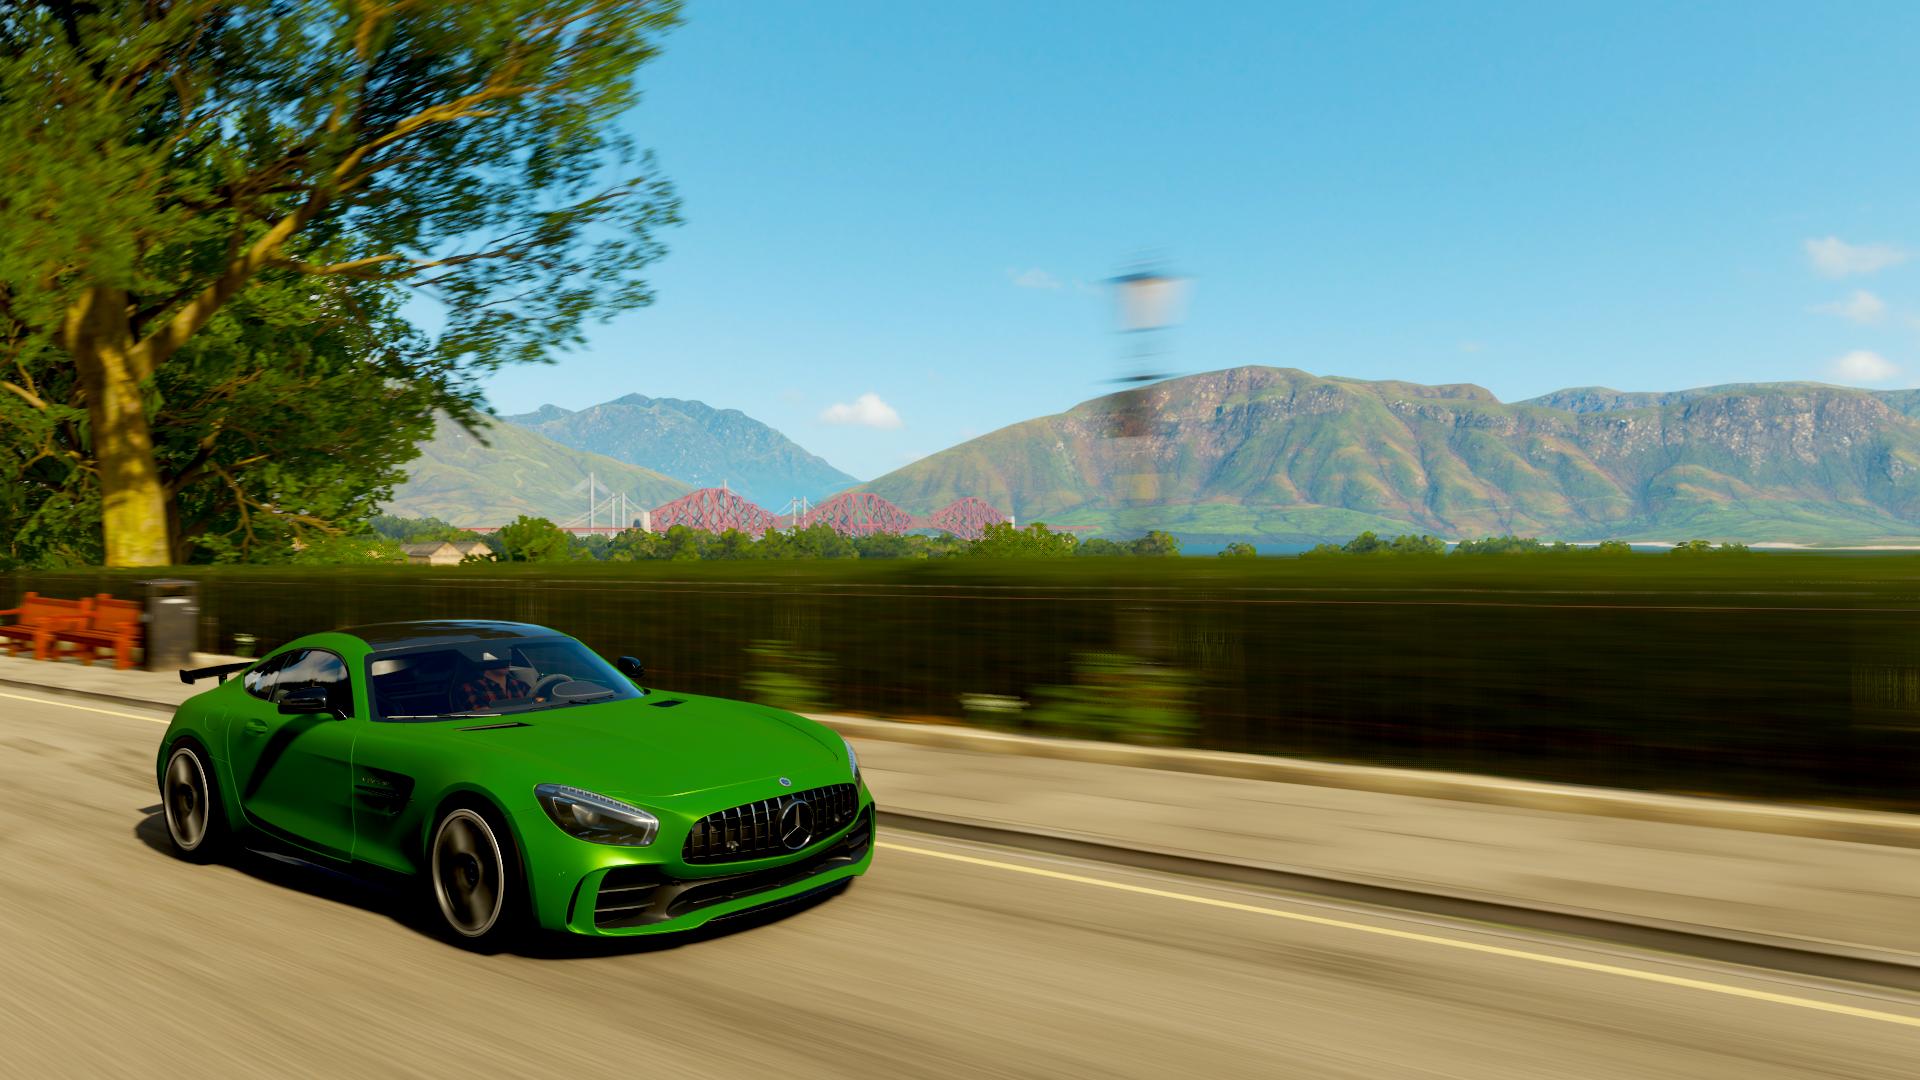 Forza Horizon 4 Mercedes AMG GT Mercedes Benz Mercedes Benz Screen Shot Car Vehicle Racing Green Car 1920x1080